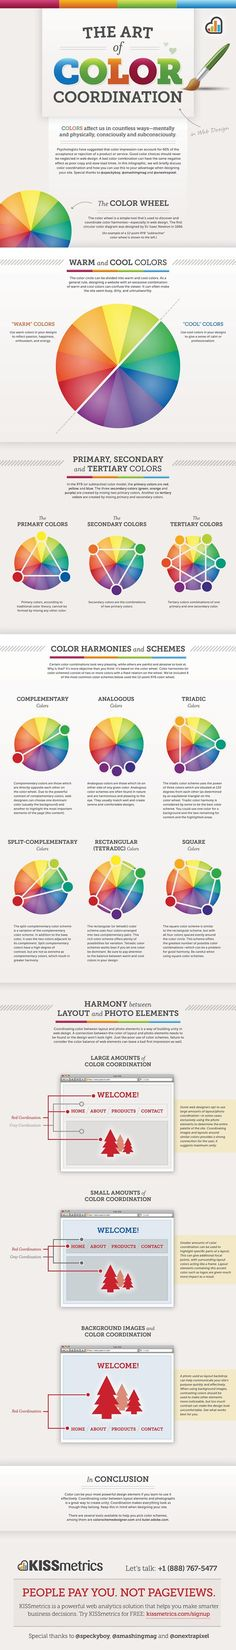 http://www.designinabox.com.br/wp-content/uploads/2012/06/infografico13_low.jpg